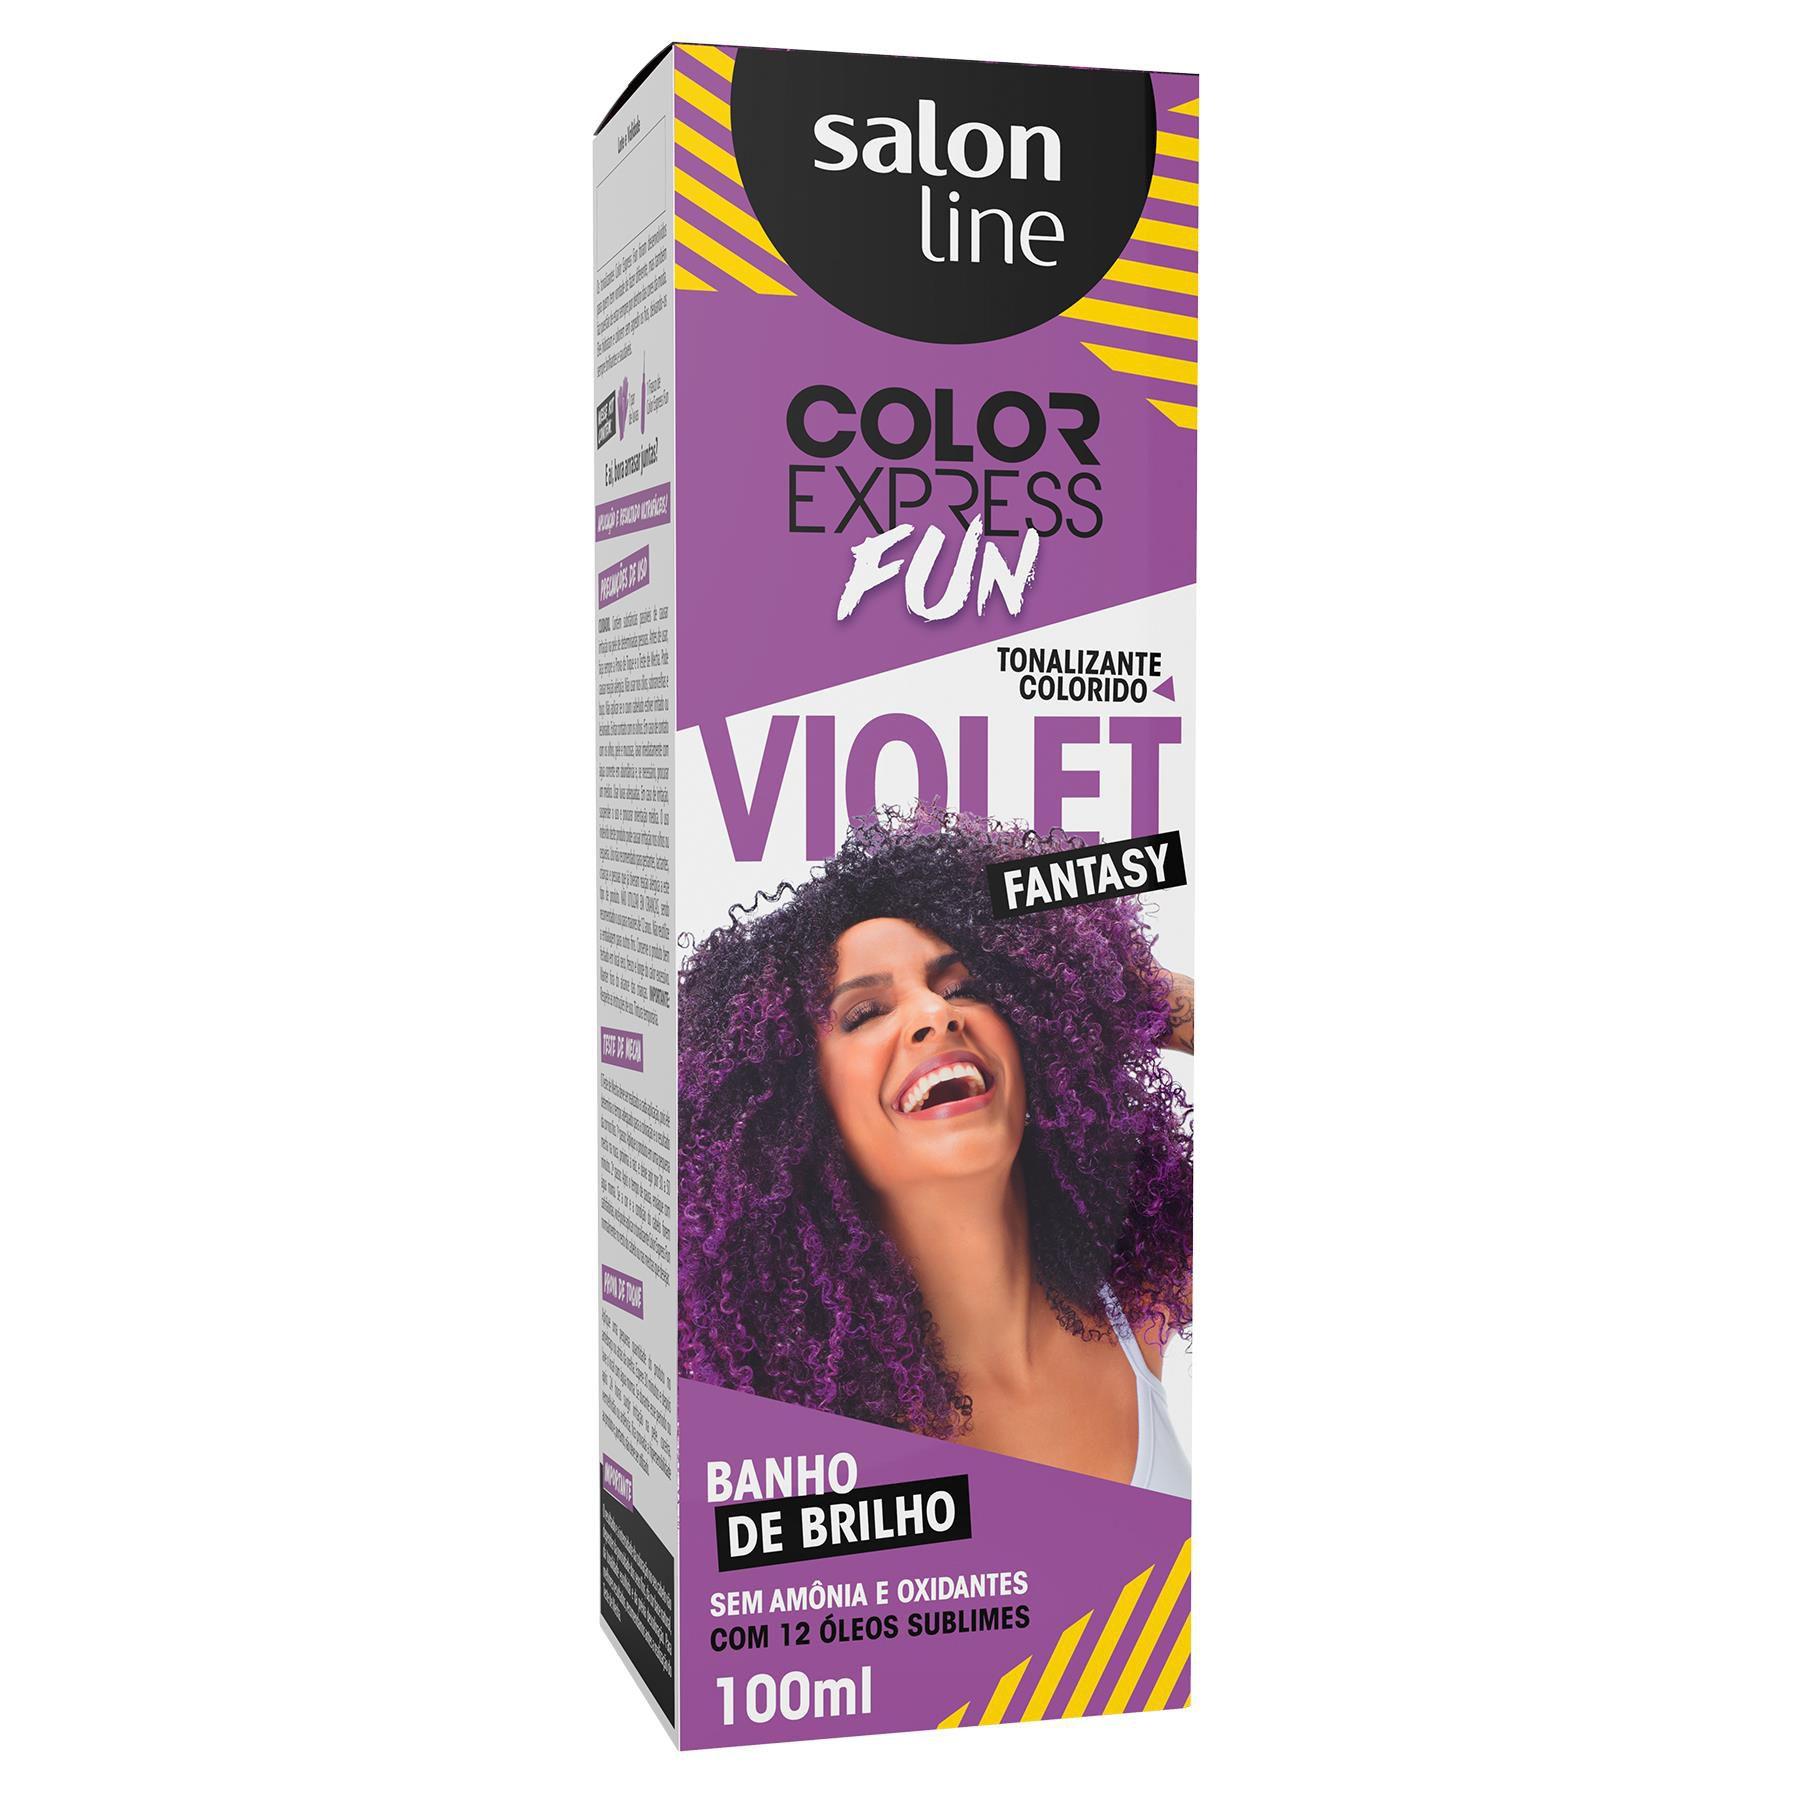 Salon Line Banho de Brilho Color Express Fun Violet Fantasy 100mL